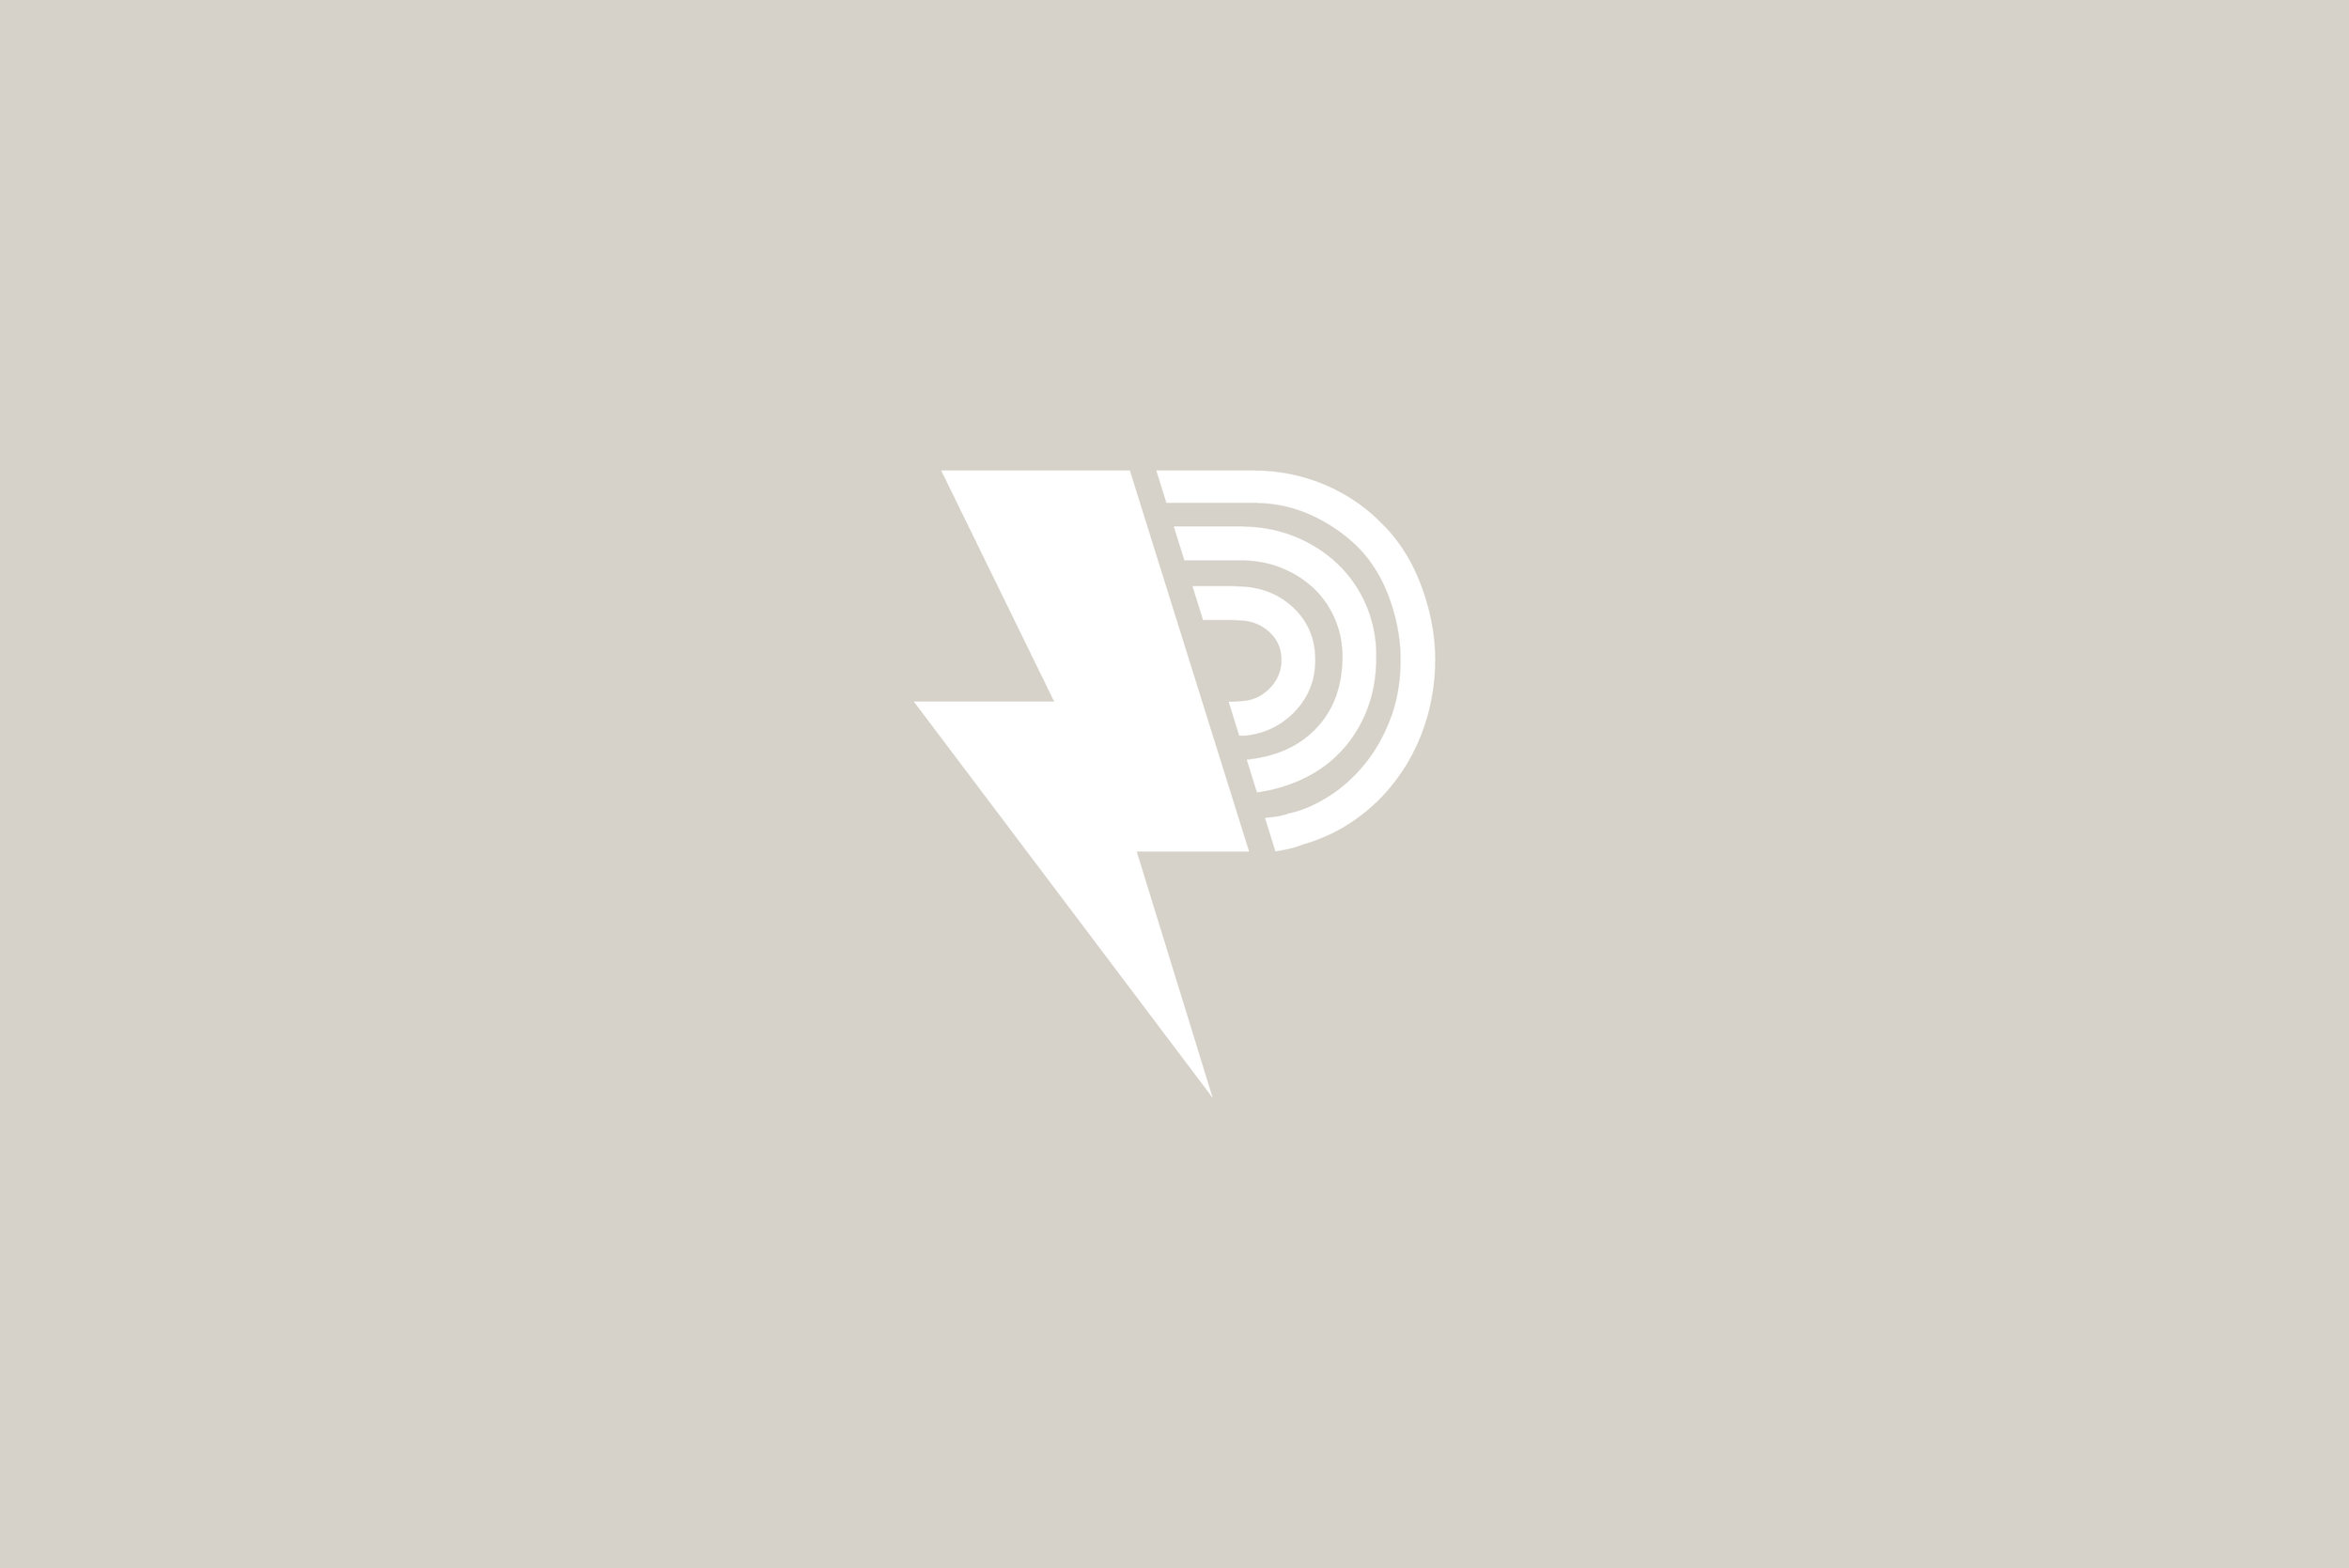 PotionCreative_Powerhouse_WebPres-2.jpg